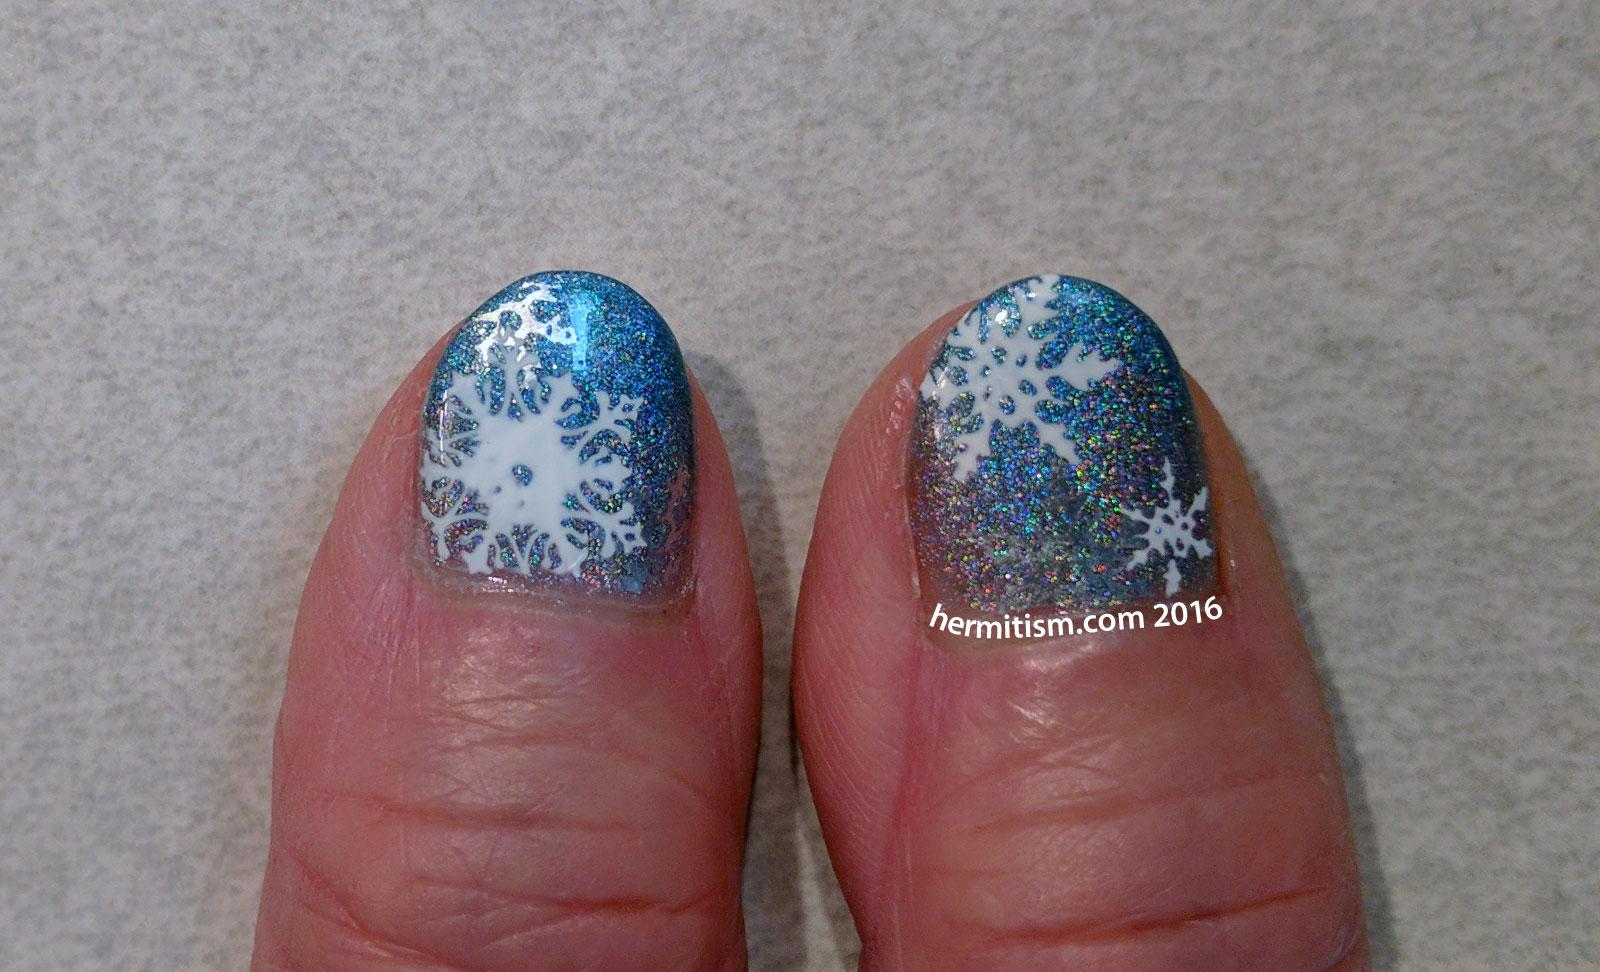 Family Manis - Snowflakes - Hermit Werds